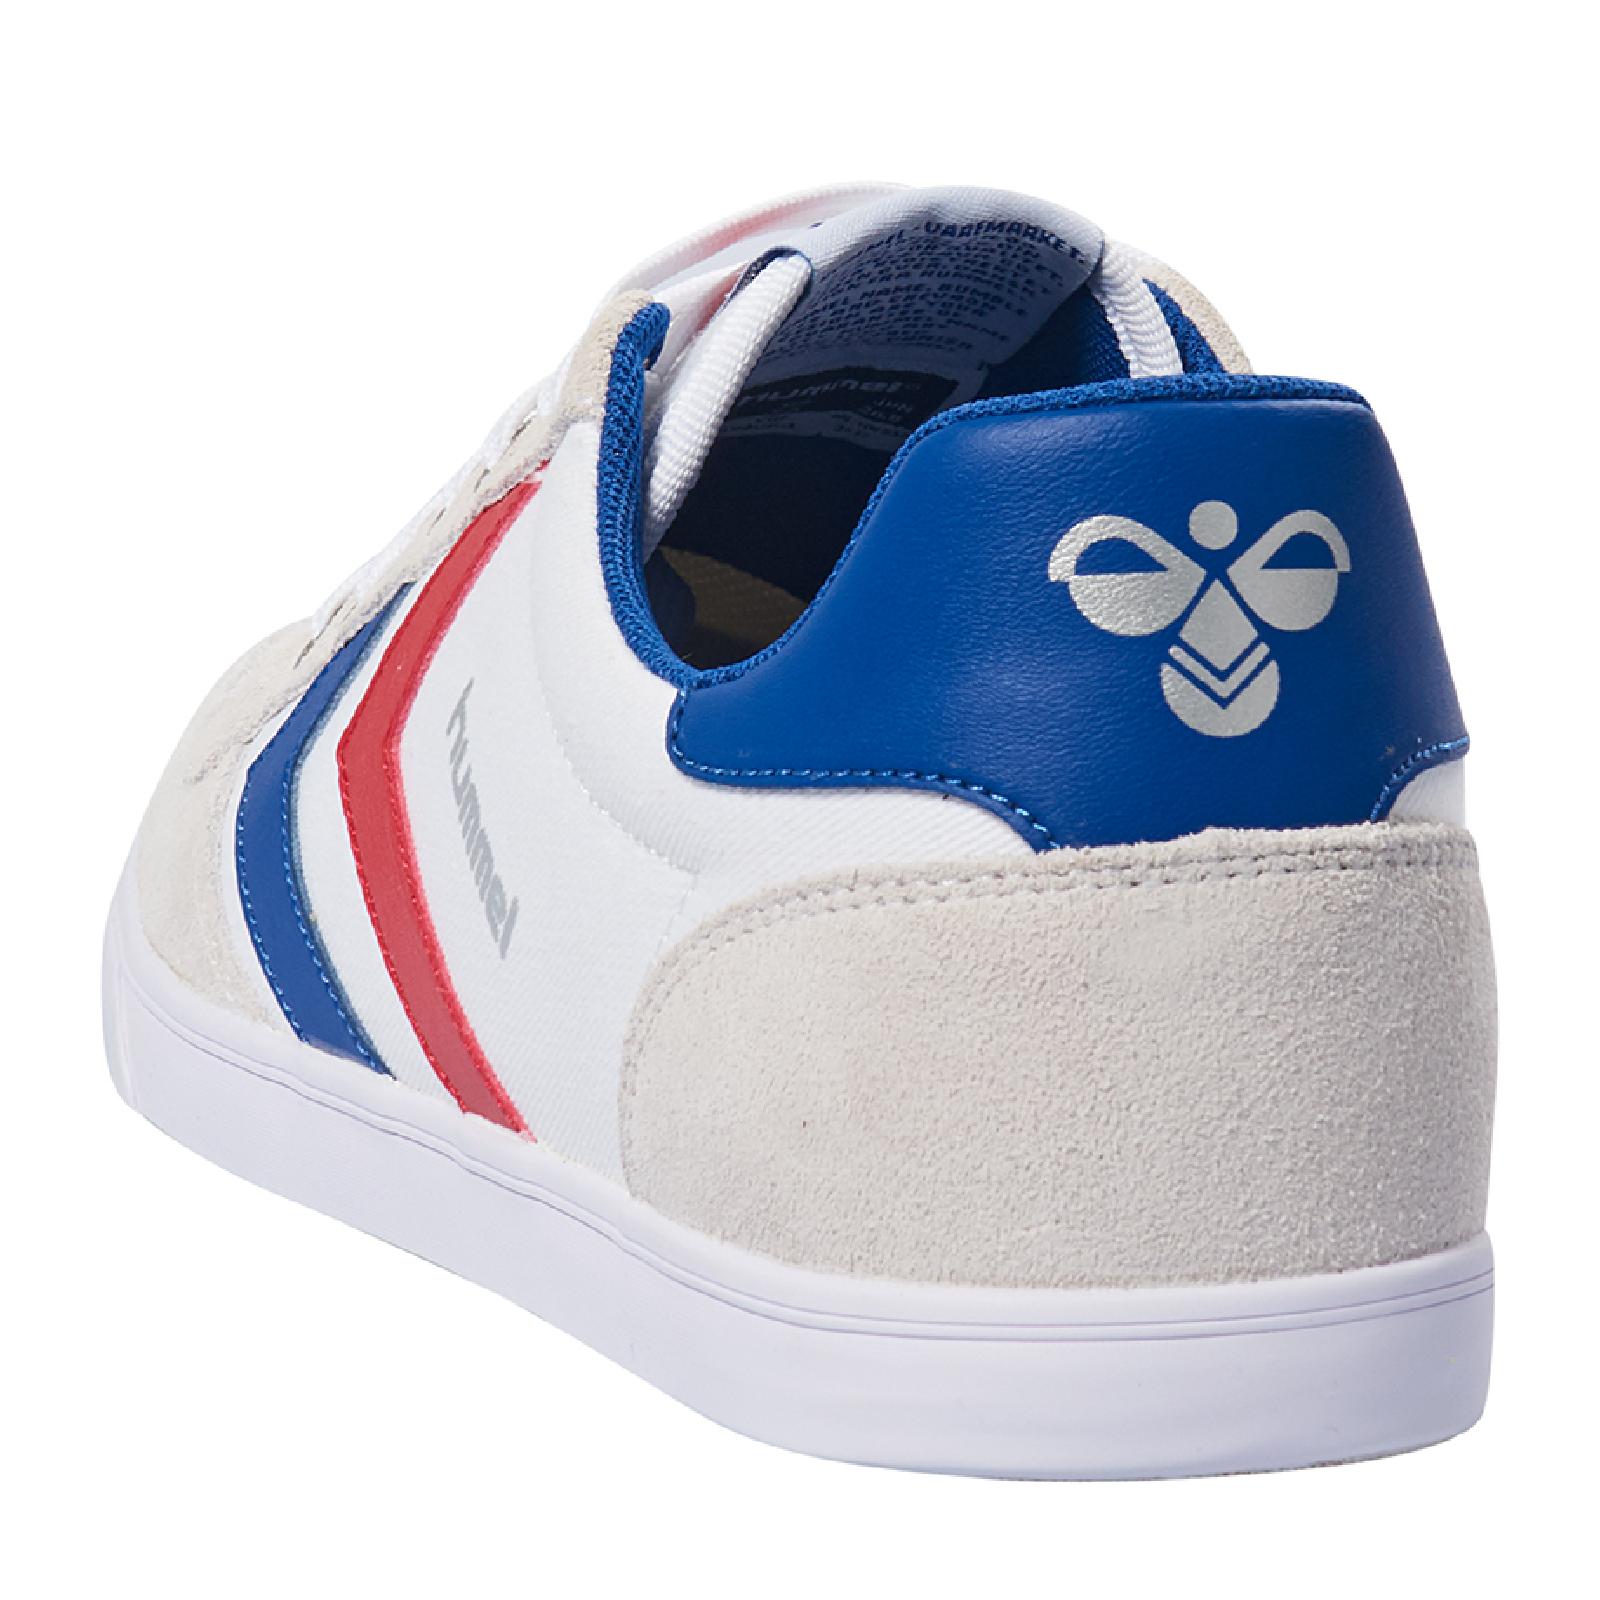 brand new dbb39 7e3ea Hummel Slimmer Stadil Low Indoor Sneaker Schuhe weiß/blau/rot 063512-9228